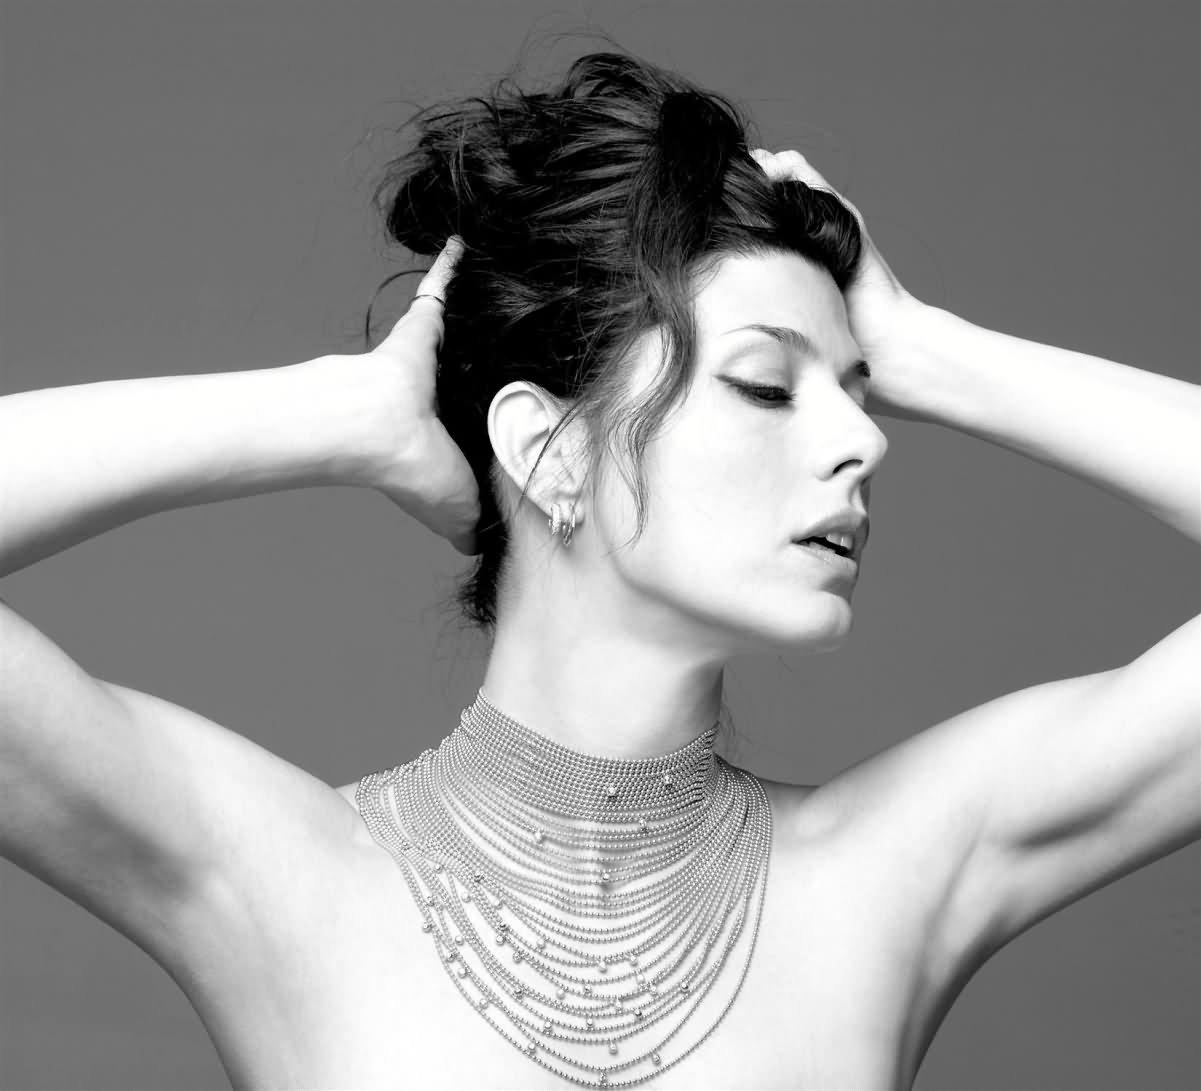 Marisa Tomei Wallpaper 23   1201 X 1091 stmednet 1201x1091